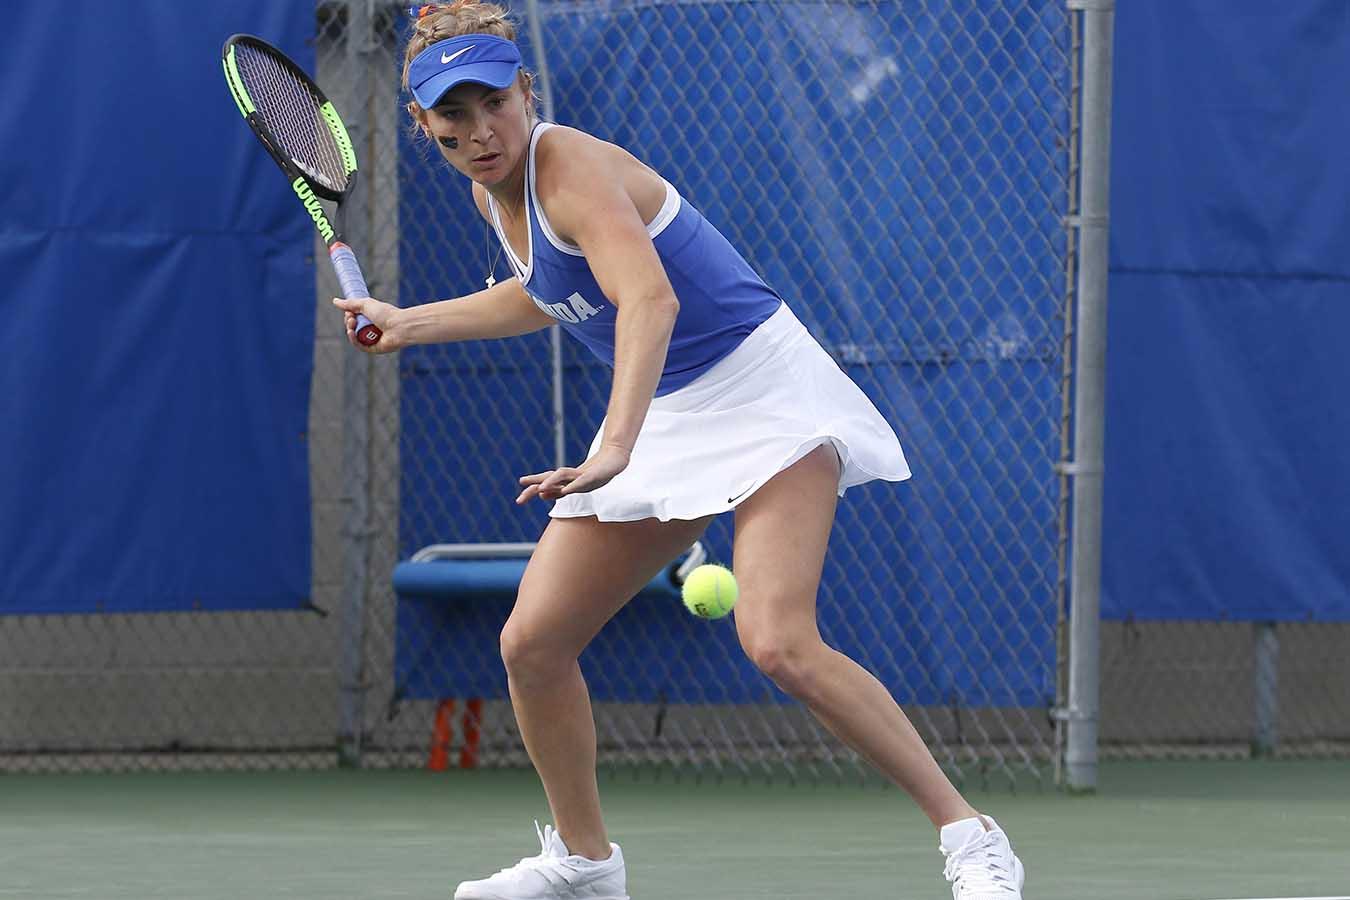 Josie Kuhlman forehand-swinging at a tennis ball.